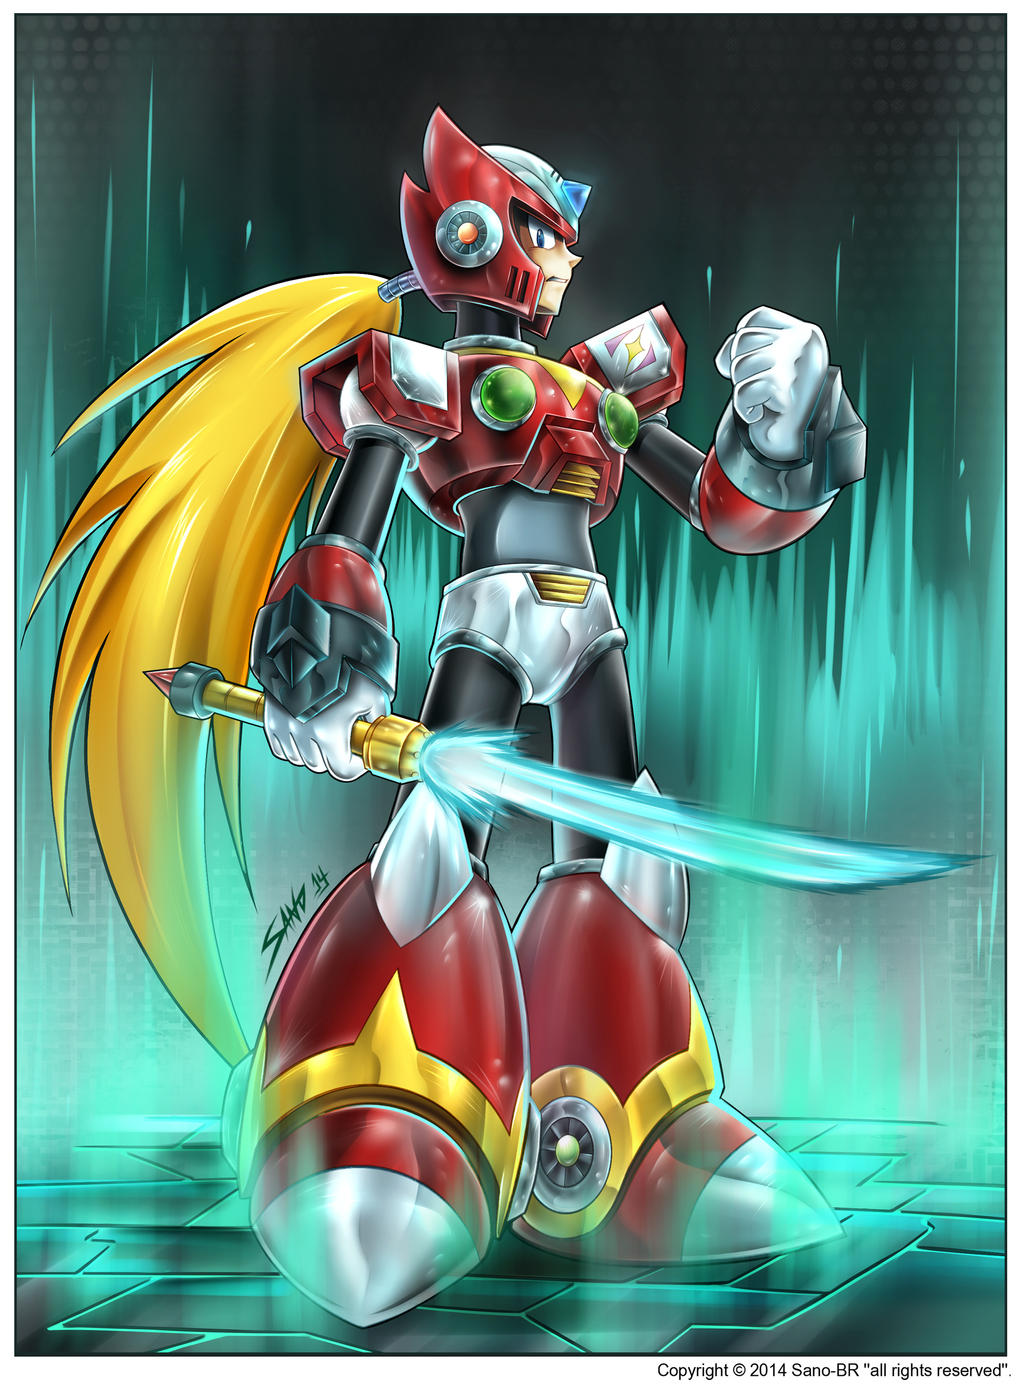 Zero - Megaman X4 by Sano-BR